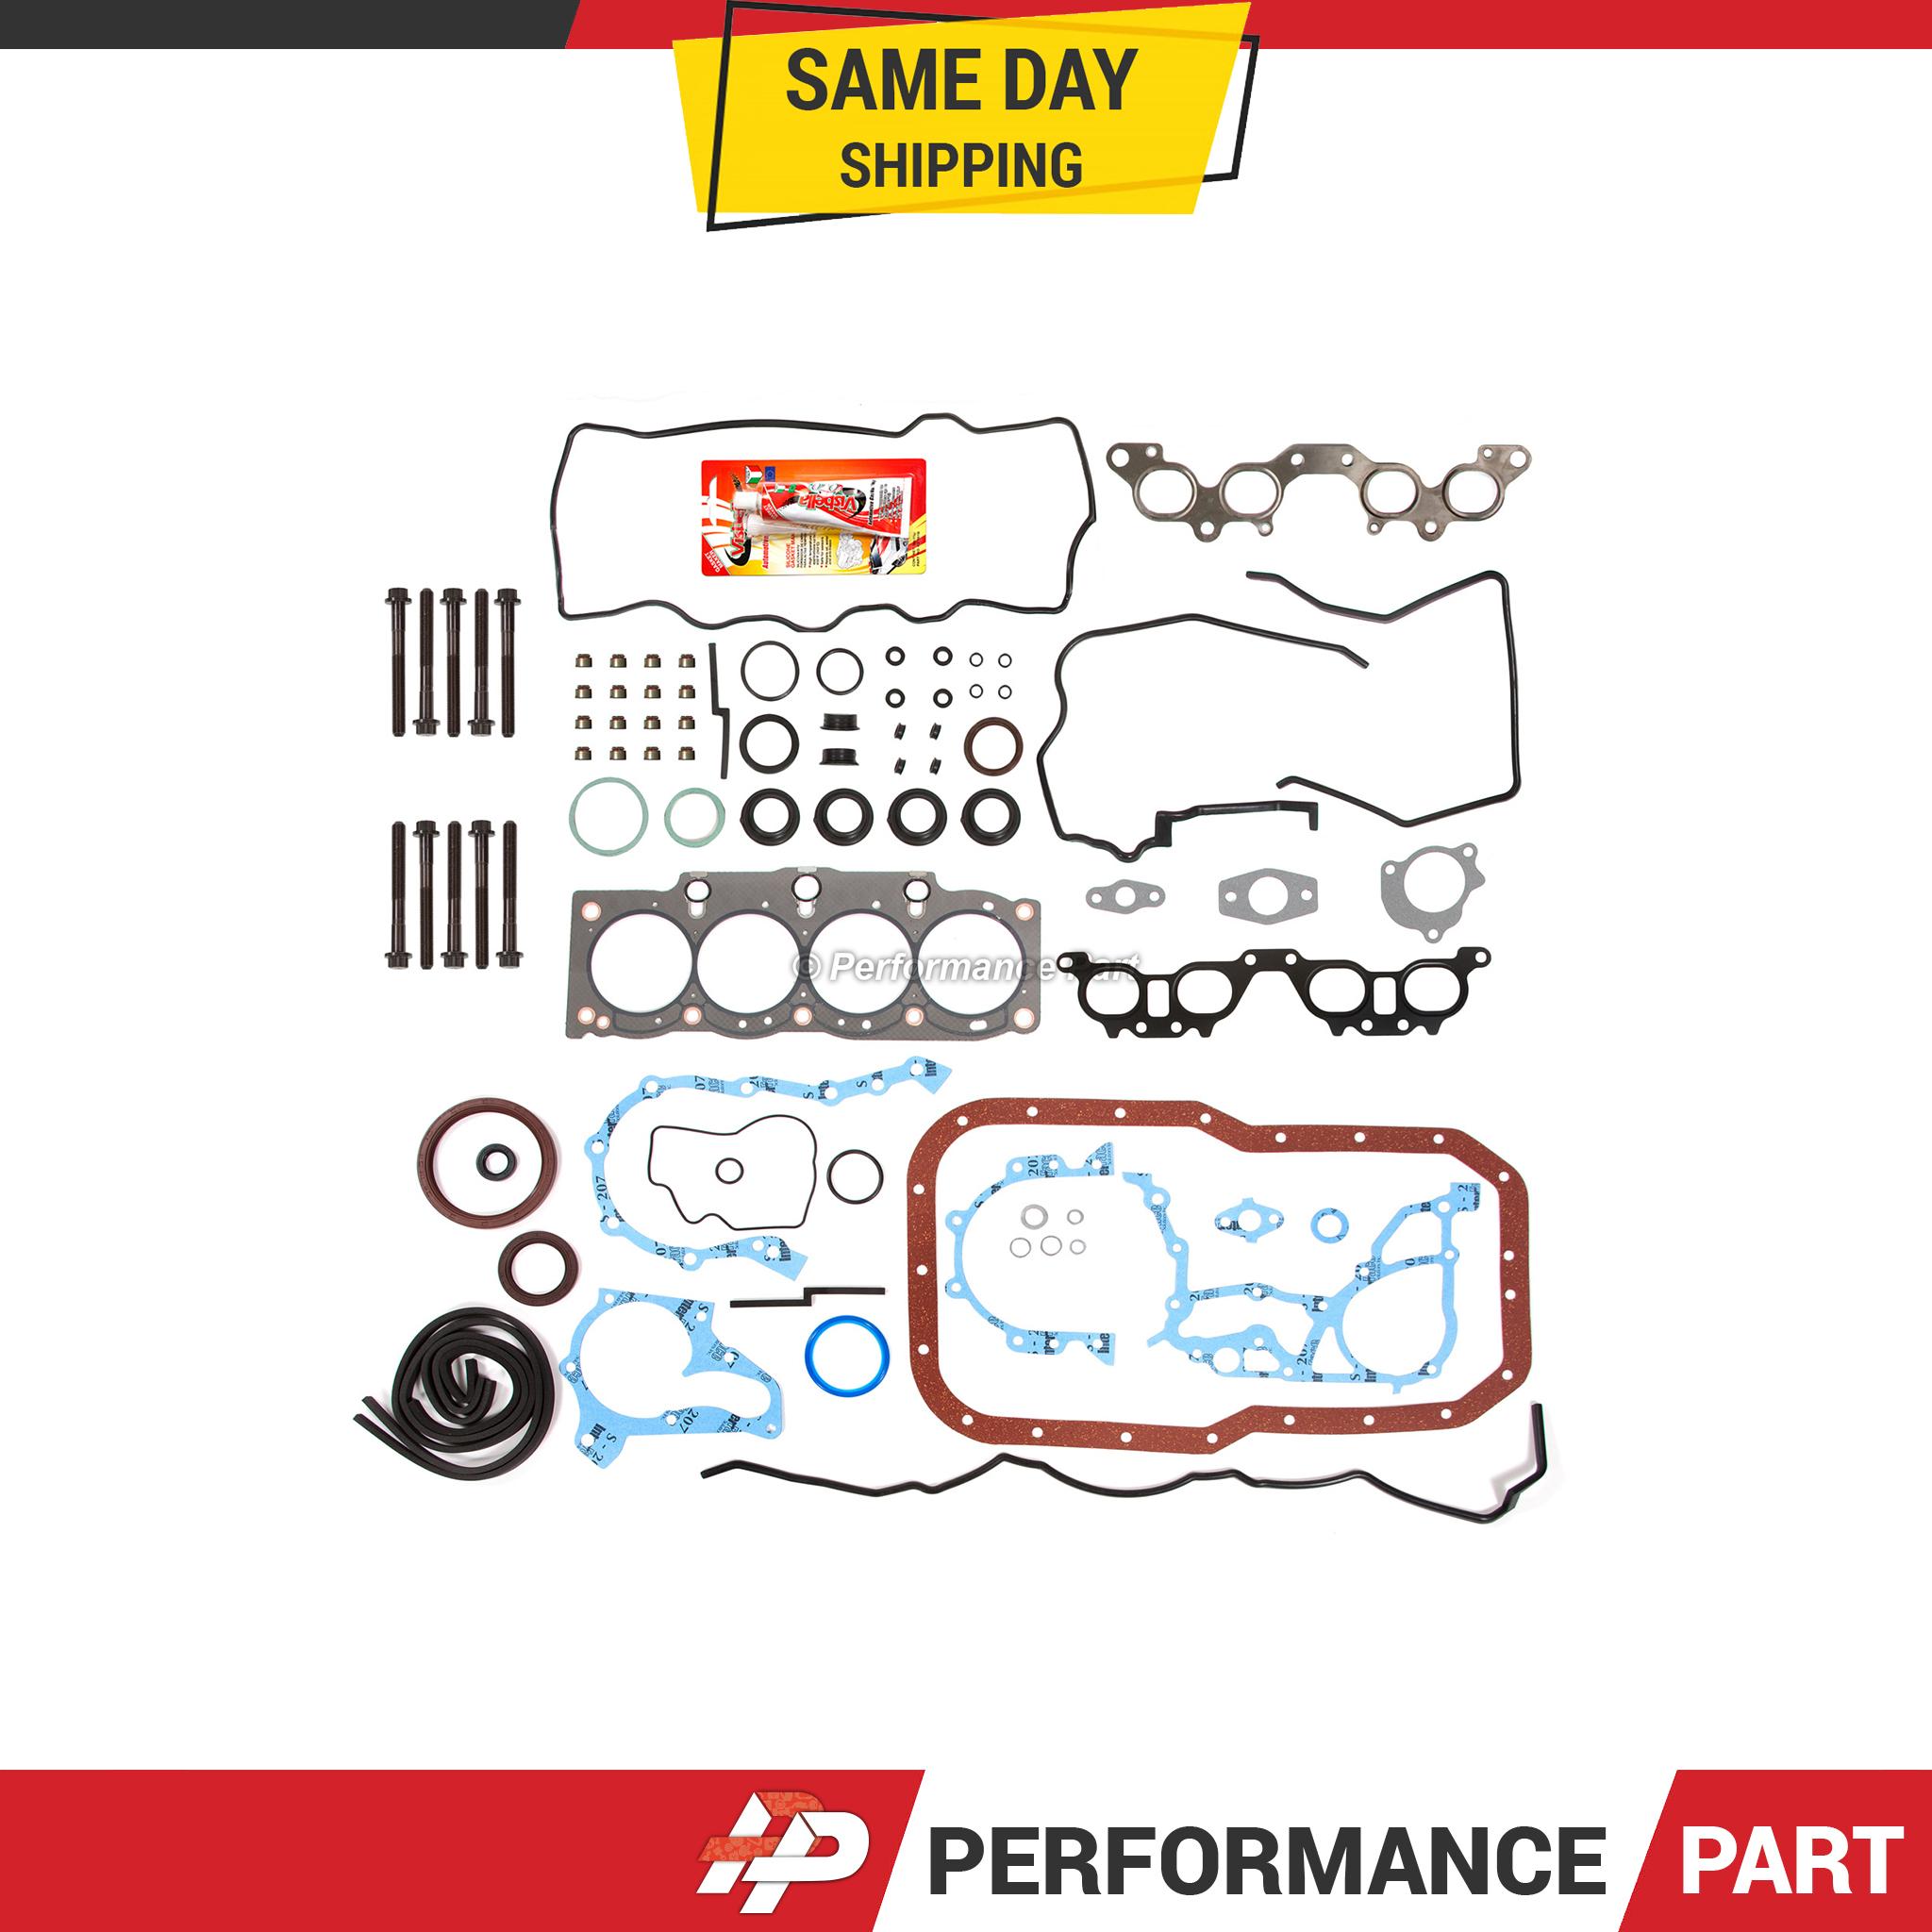 Details about Full Gasket Set Head Bolts for 96-00 Toyota RAV4 2 0L DOHC  3SFE 16 Valve